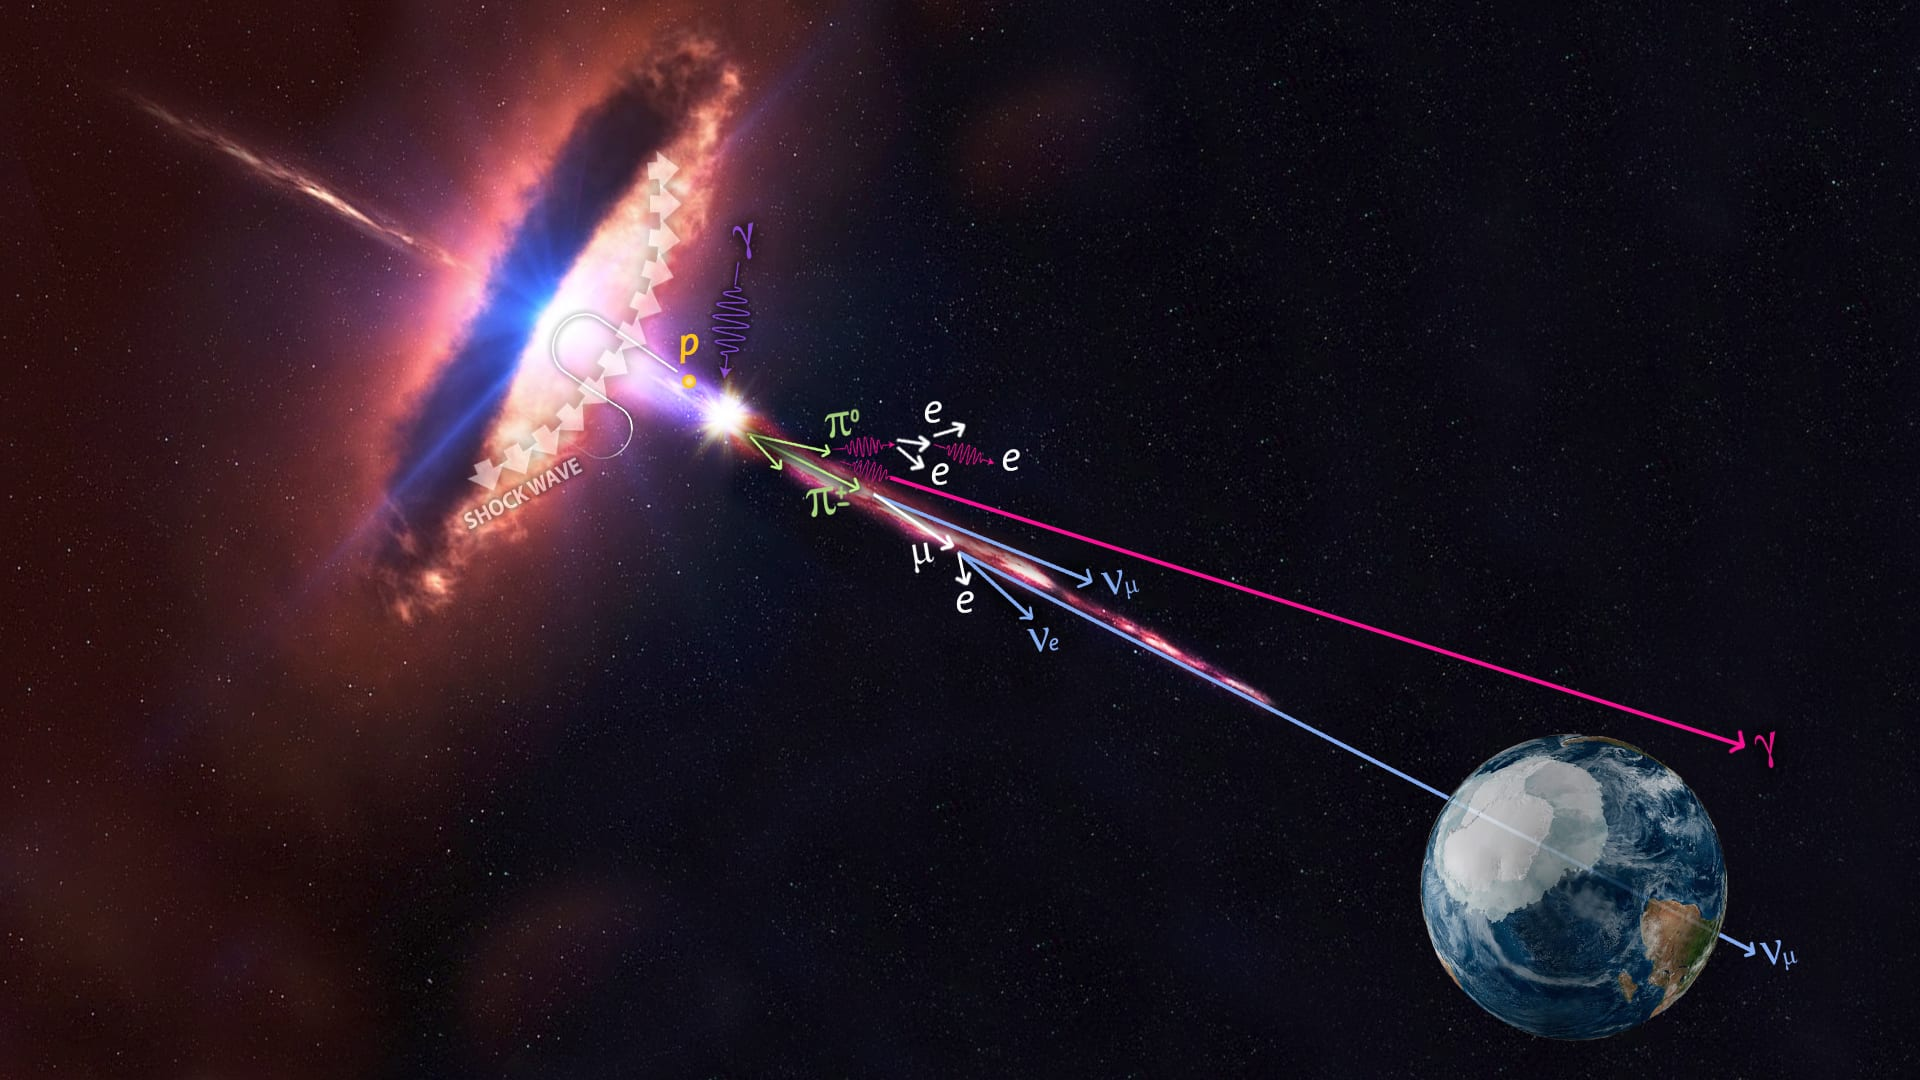 A blazar emitting neutrinos and gamma rays